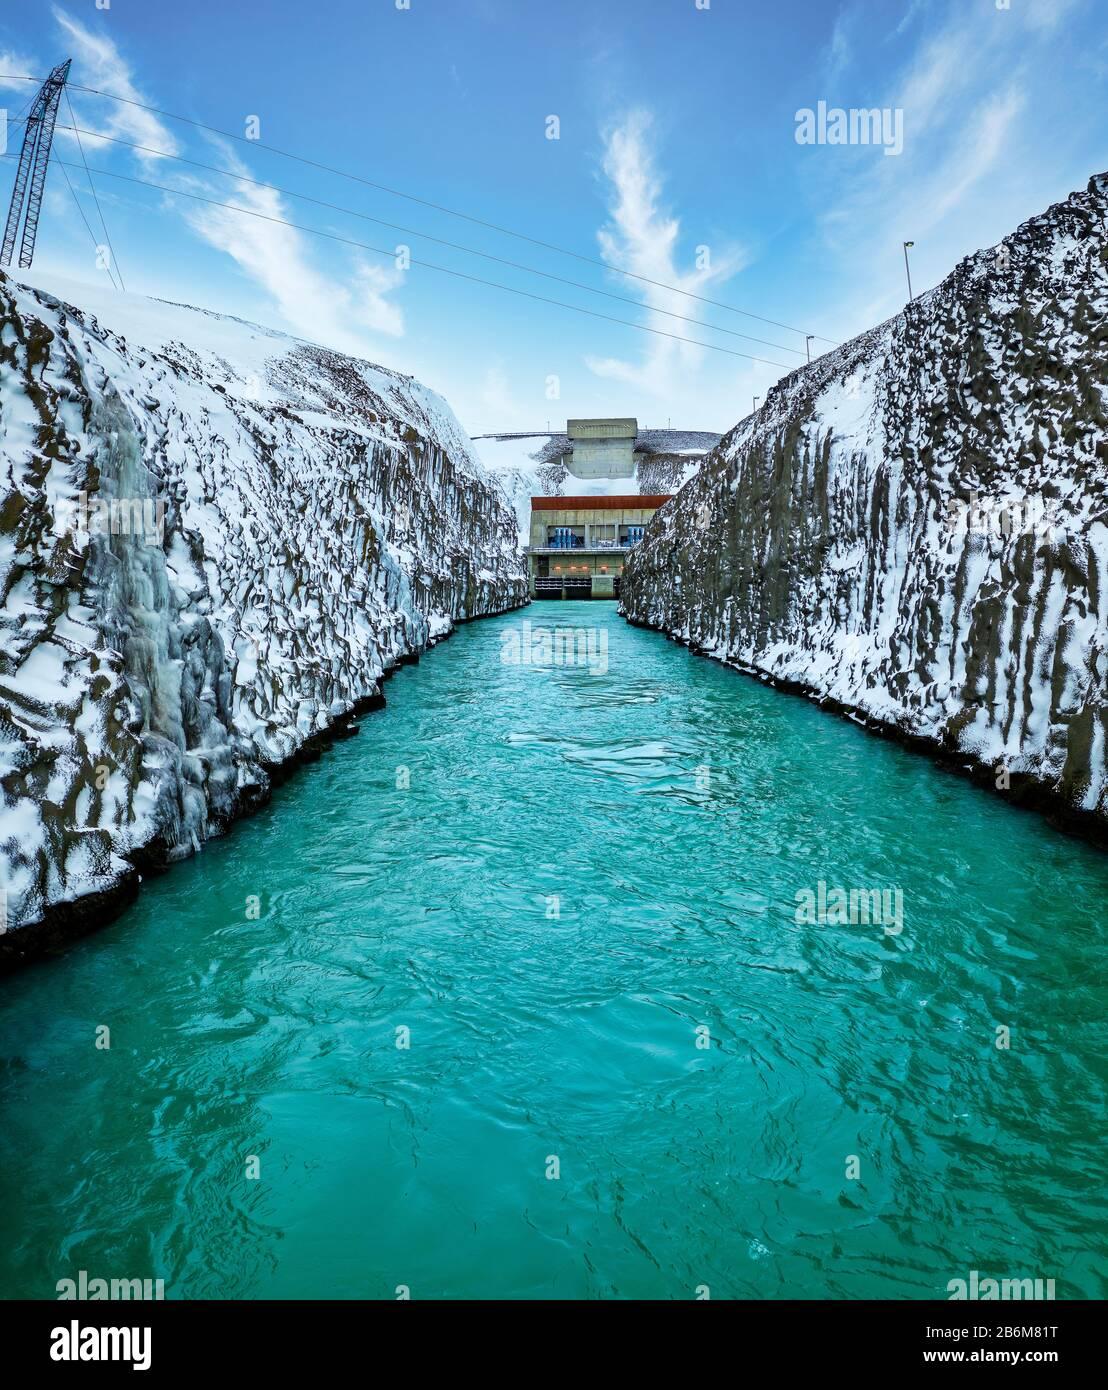 Sultartangavirkjun hydro power plant, Central Highlands, Iceland Stock Photo